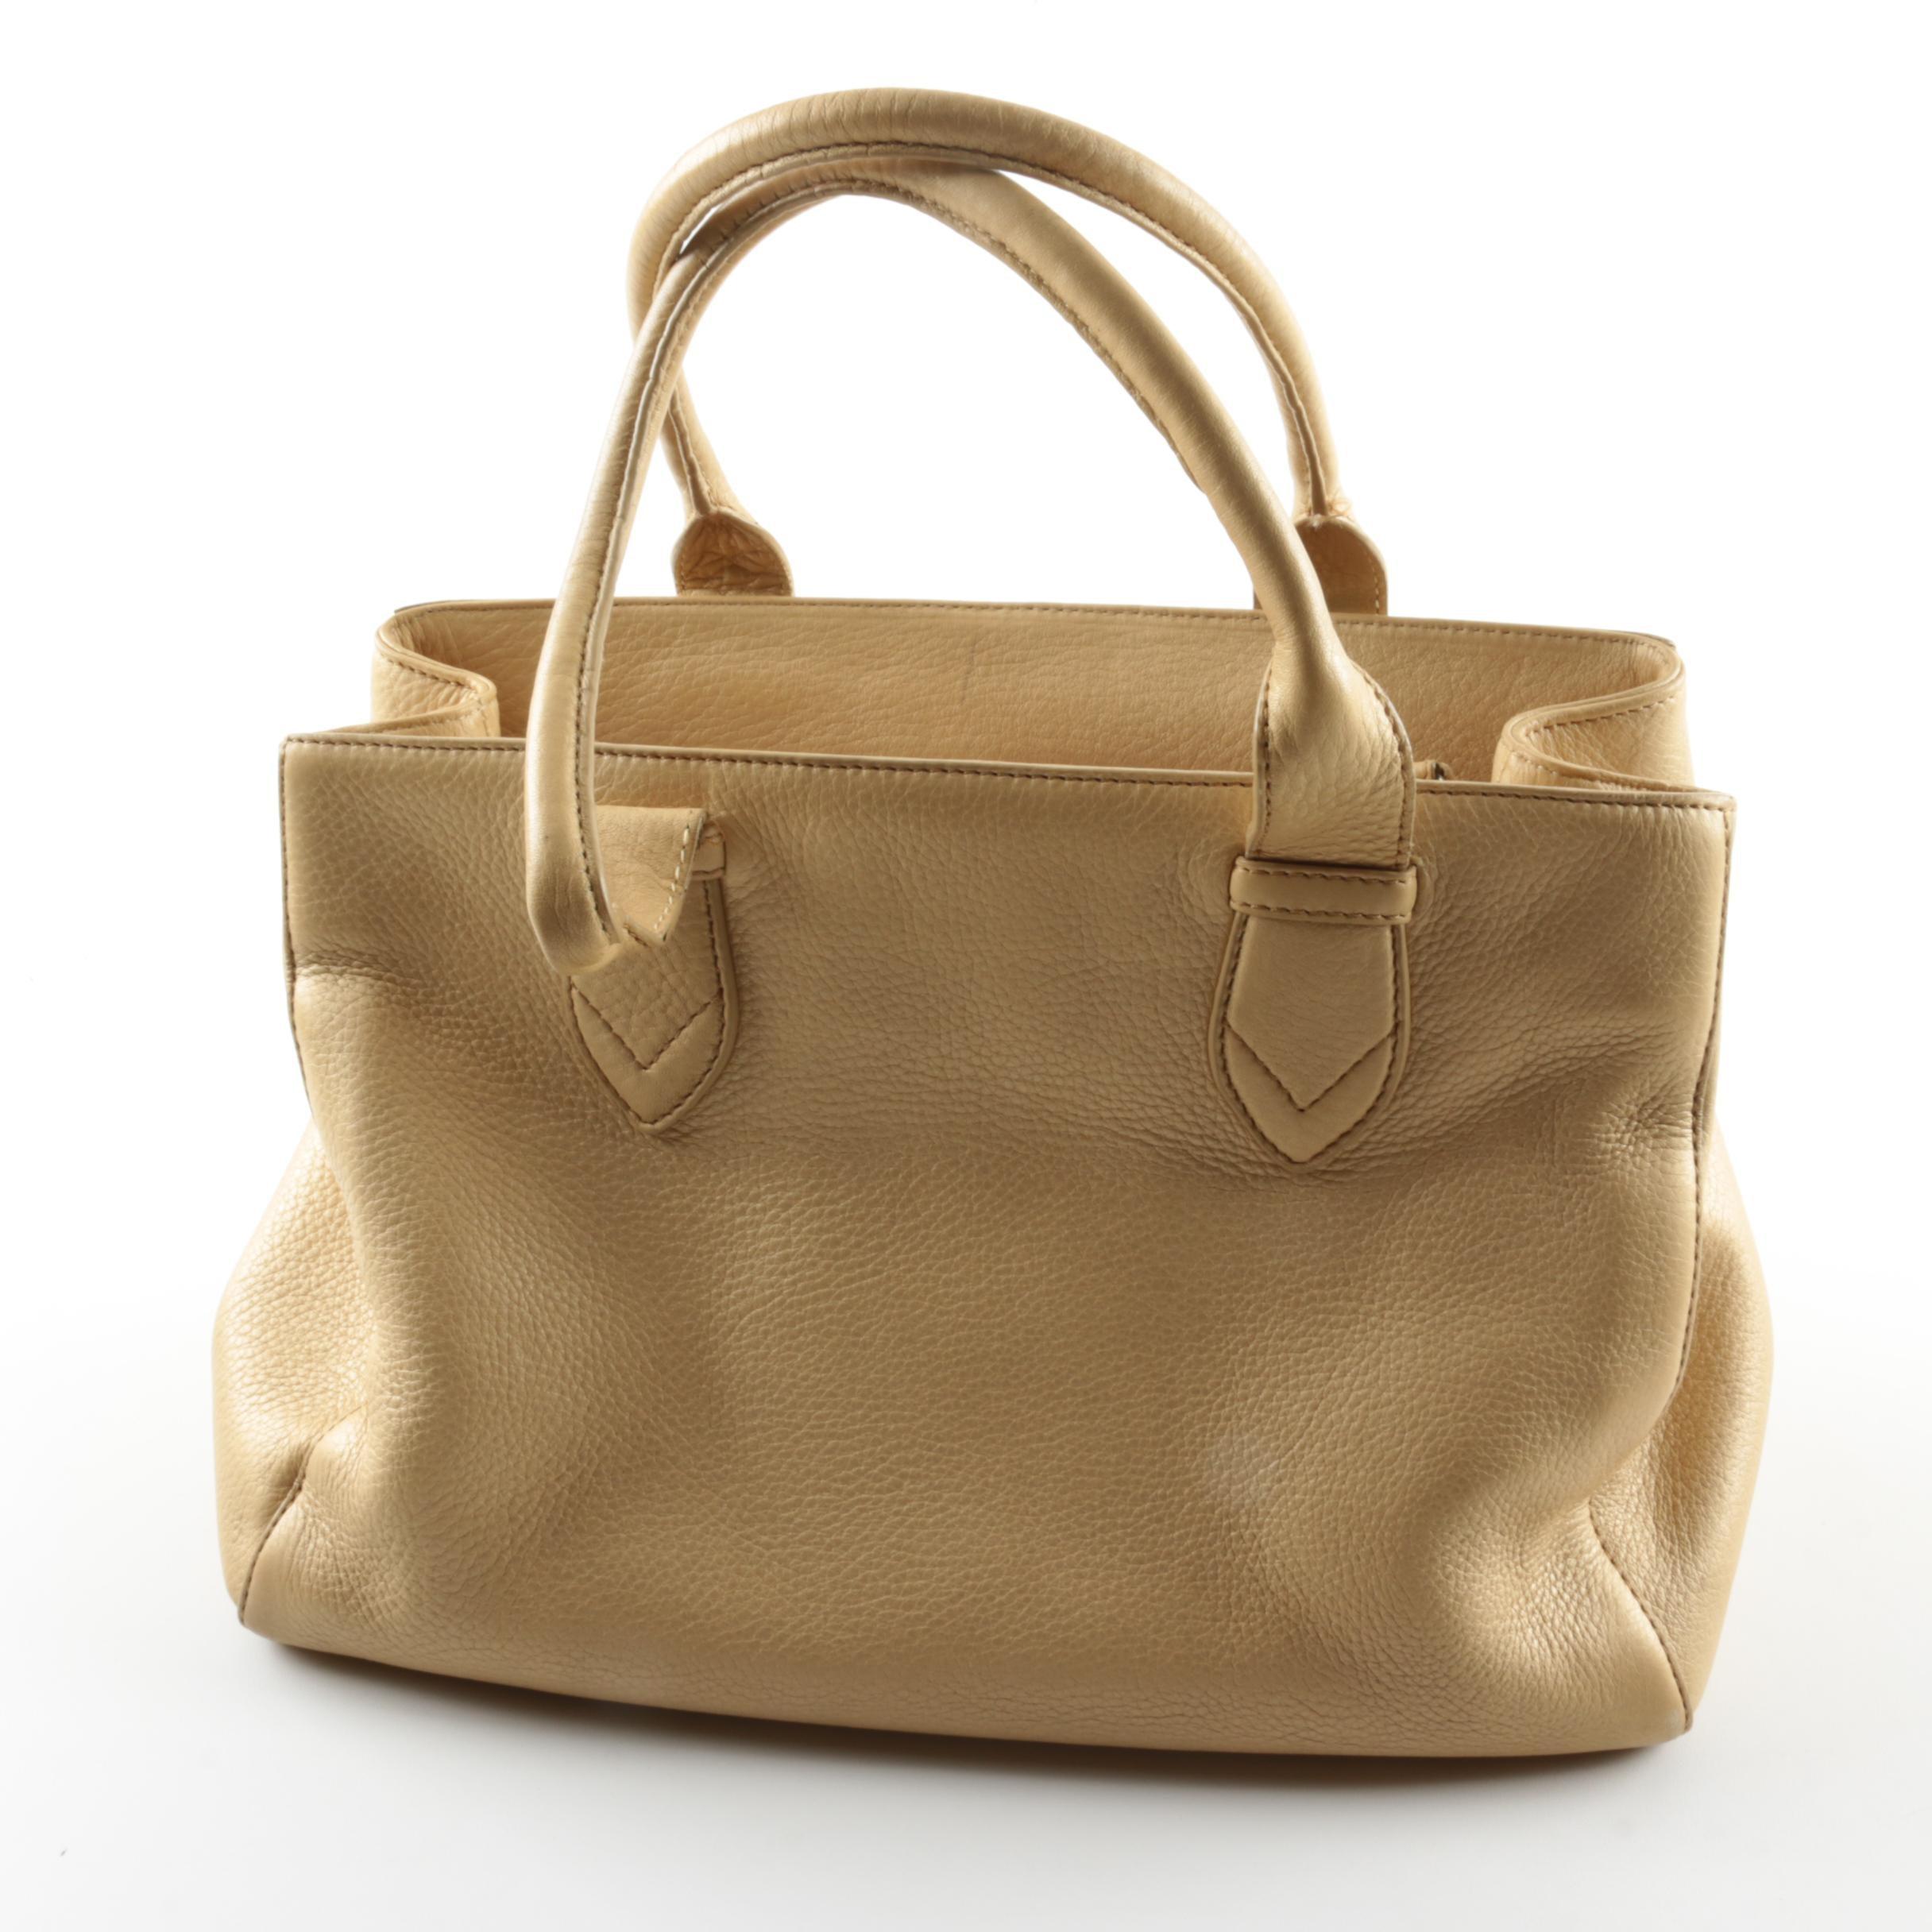 Cole Haan Village Pebbled Leather Handbag